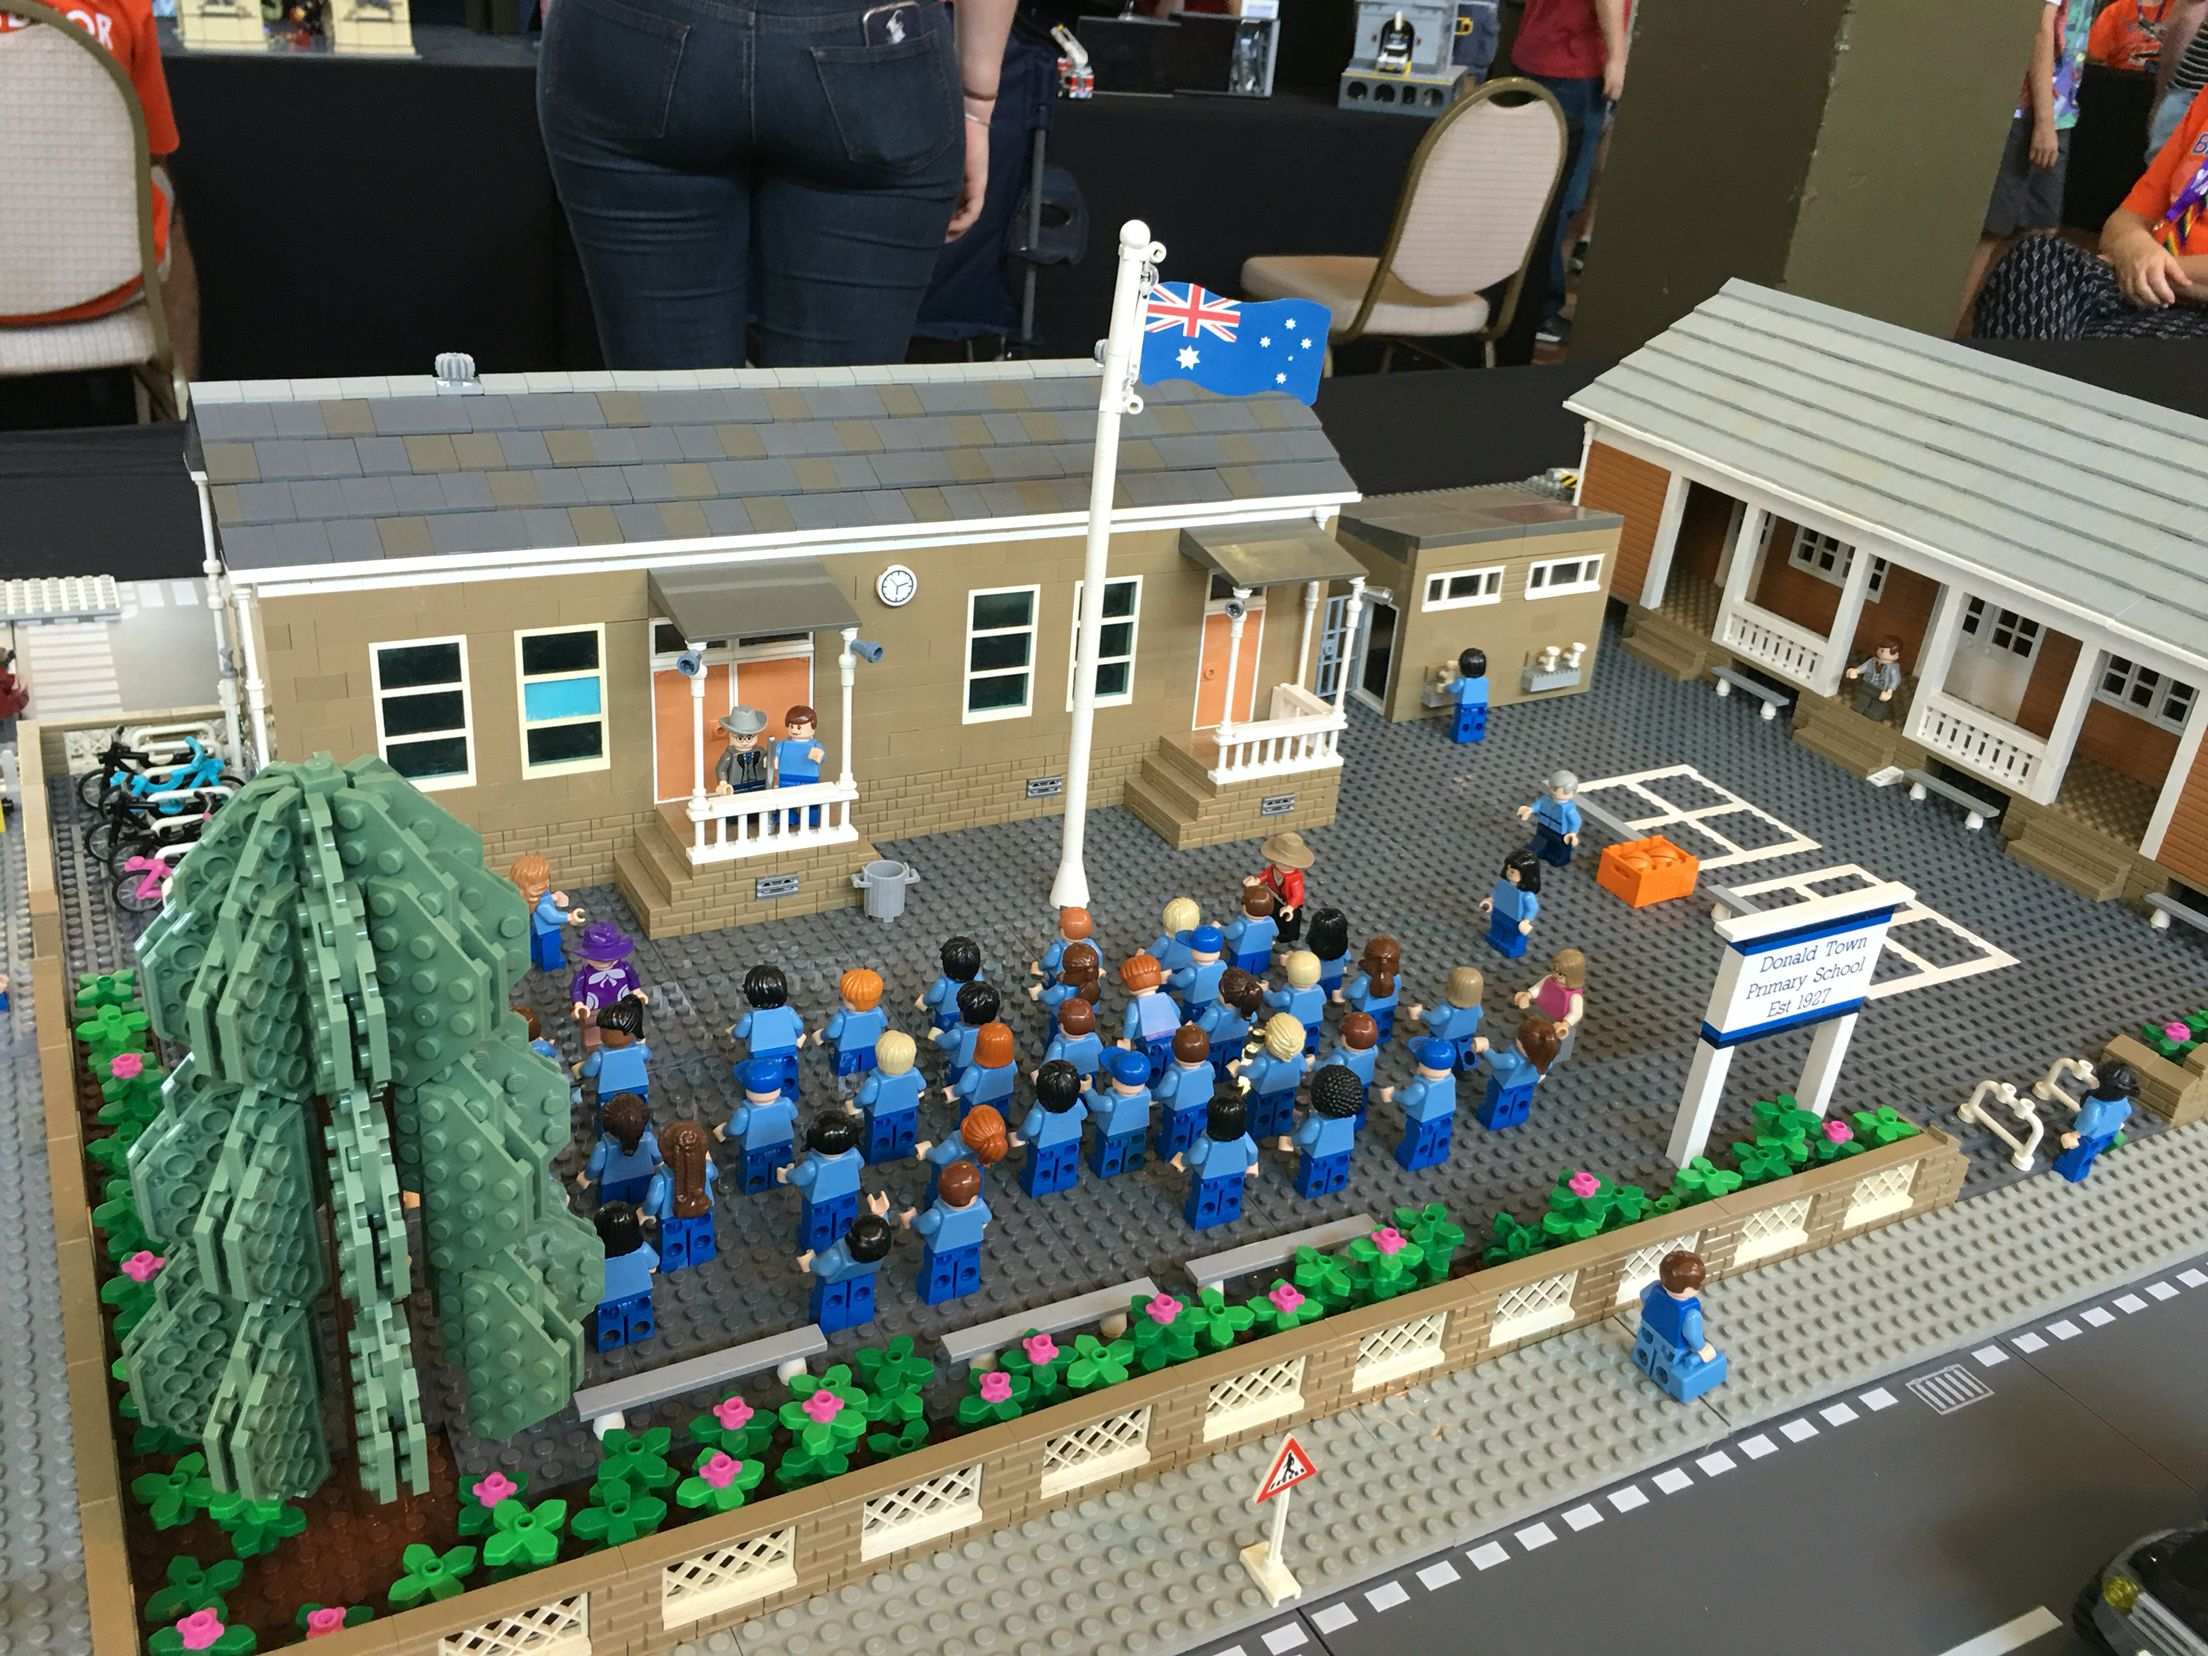 #Brickvention 2016 @ the Royal Melbourne Exhibition Building. Schools in...